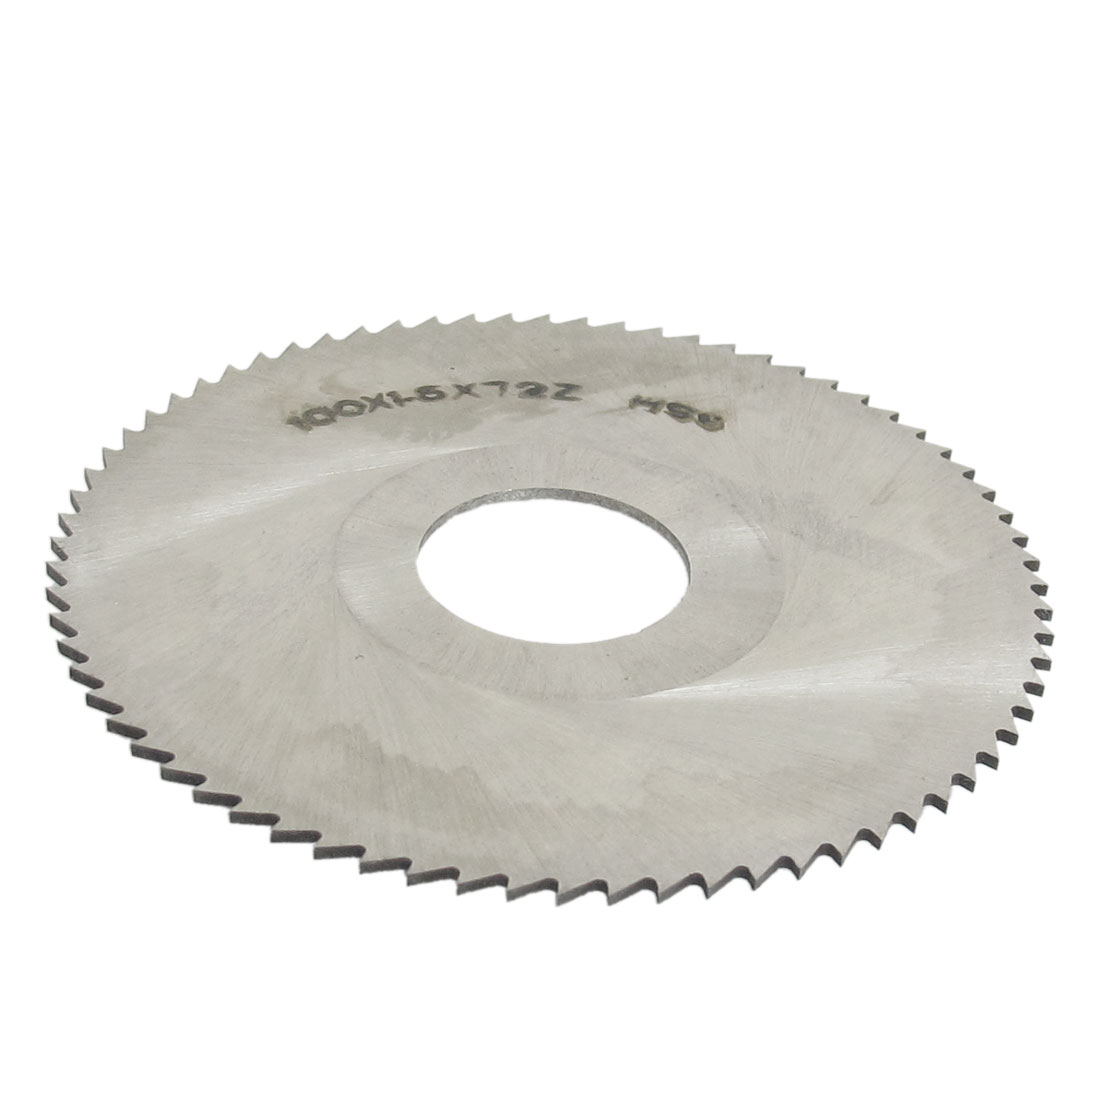 27mm Arbor Hole Dia 1.5mm Thick 72 Teeth HSS Circular Slitting Saw